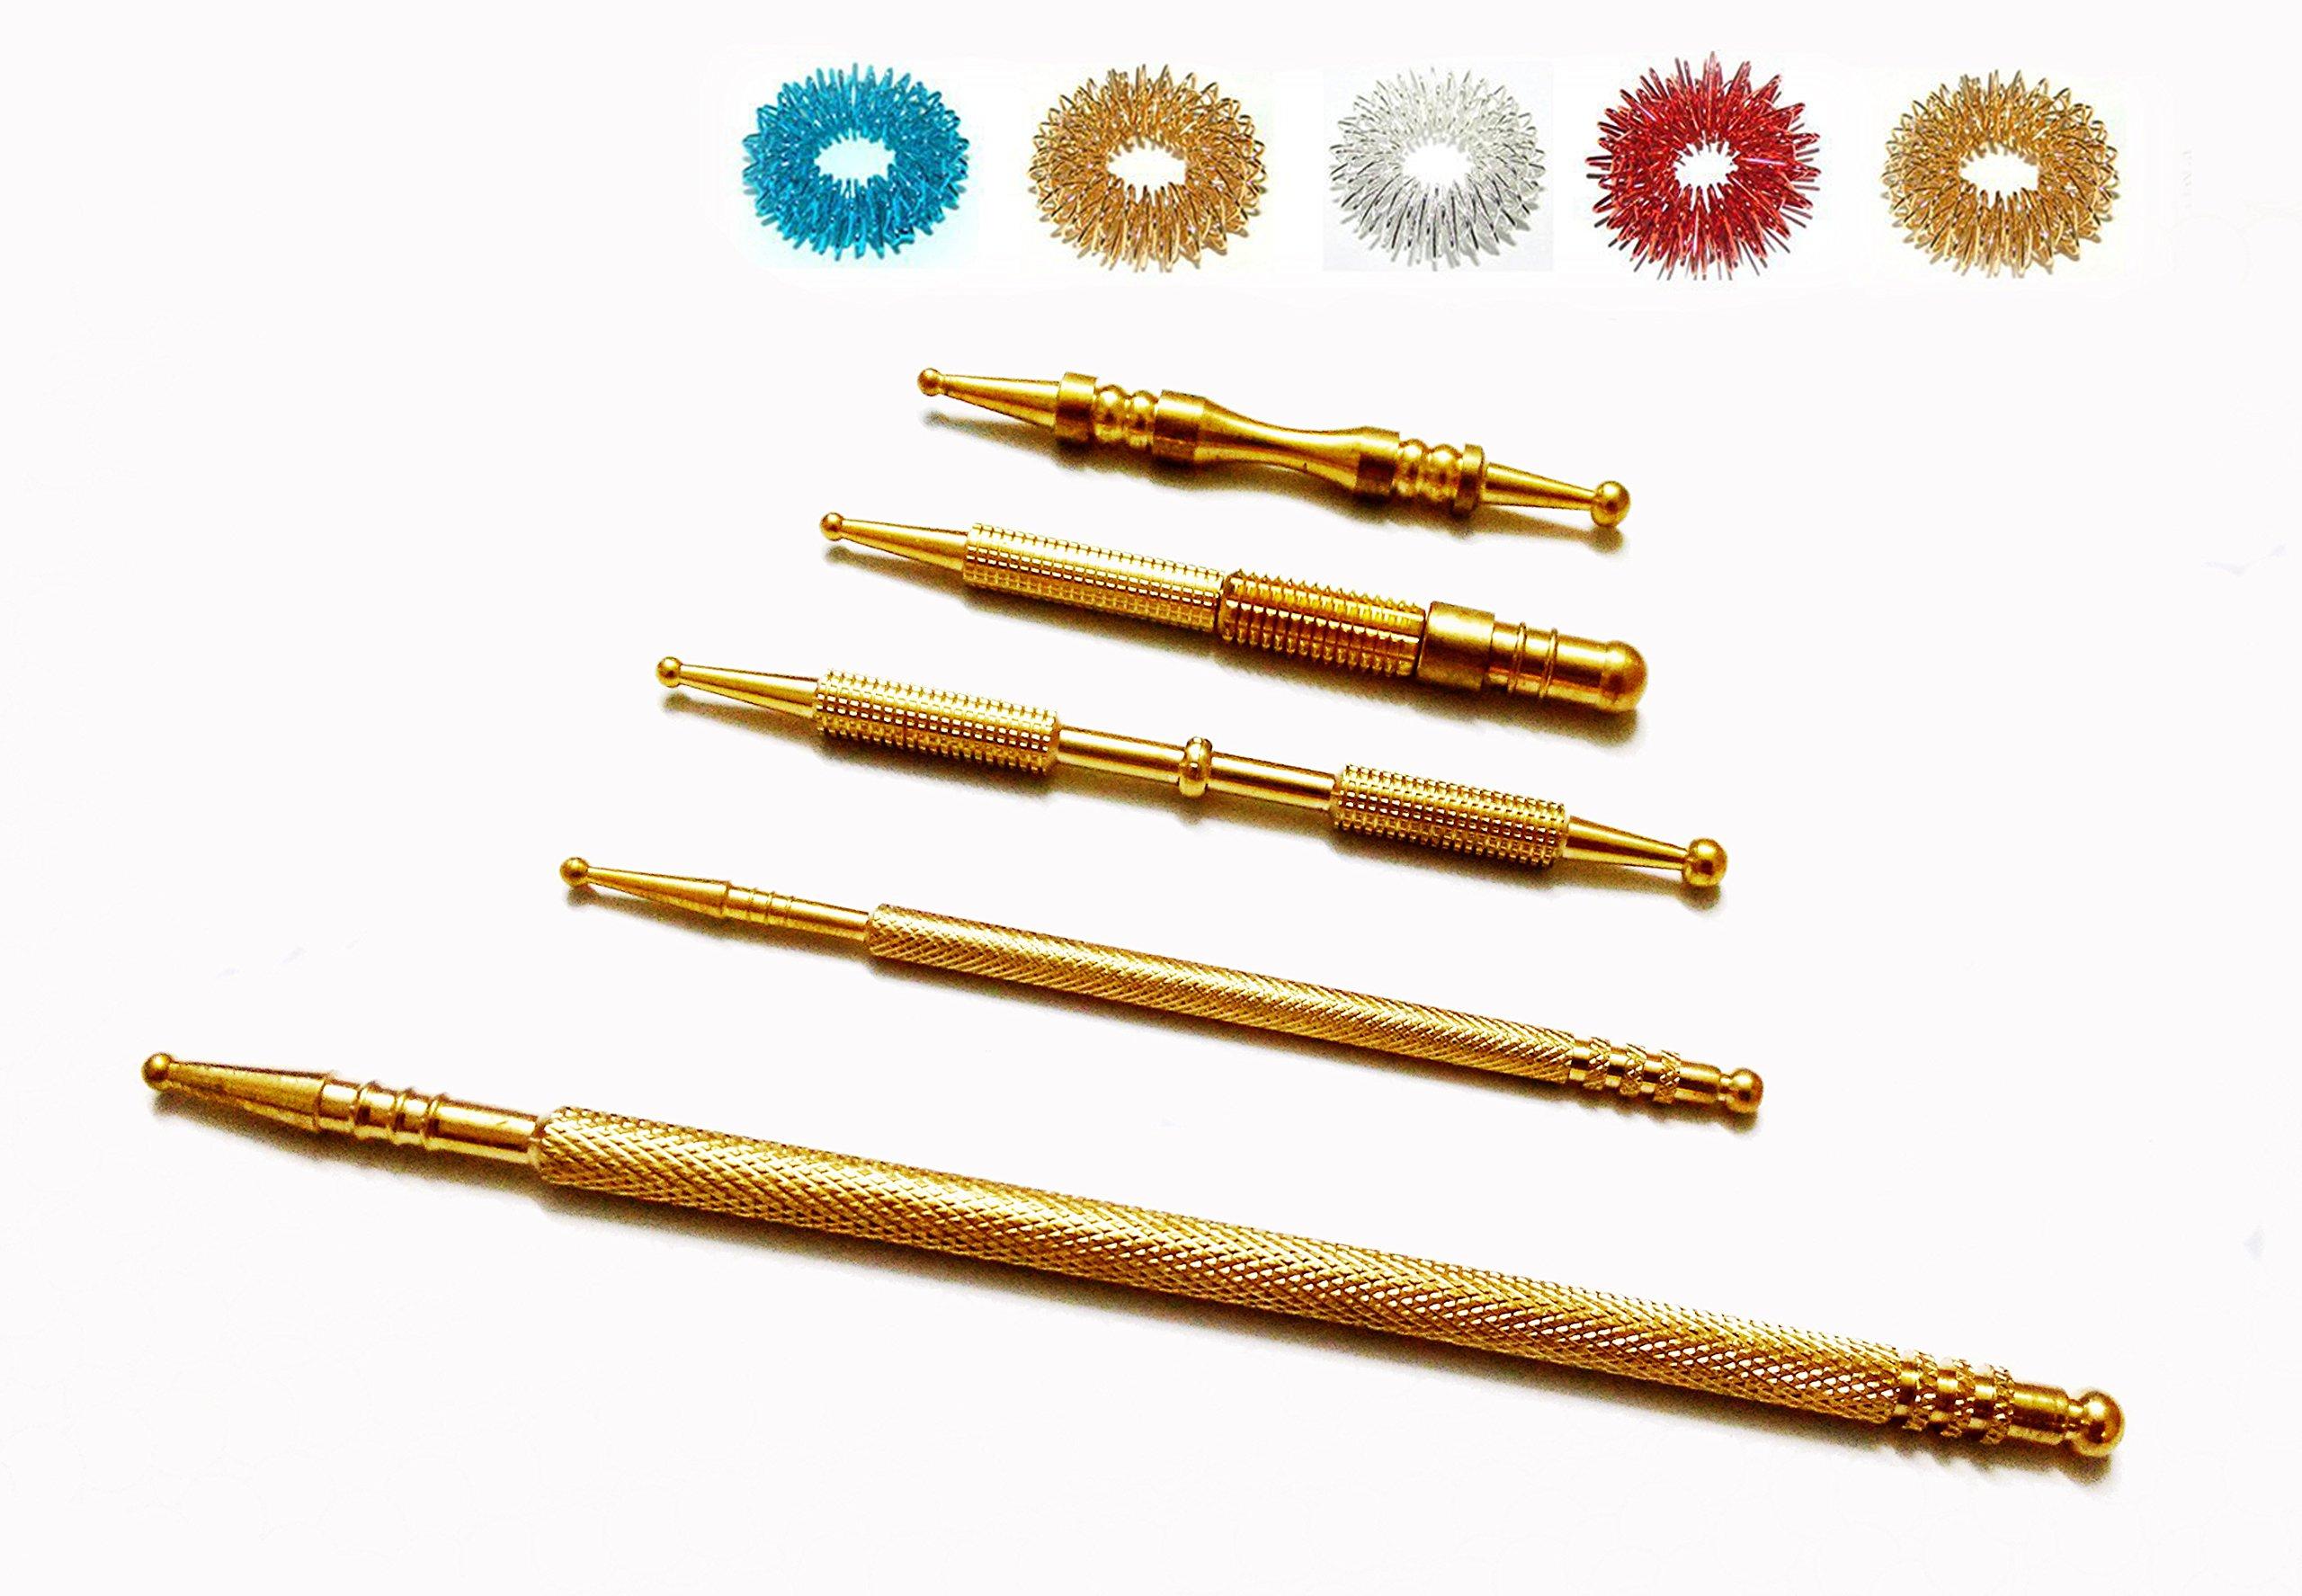 ACS / ACM Sujok Probe Acupressure Metal Brass Diagnostic Roller Jimmys Set 5 Types + 5pcs Rings Mega & Long Jimmy L - 15Cm, Dia - 0.6Cm, Slim Long L – 10Cm, Long Cut L – 9.6Cm Brass